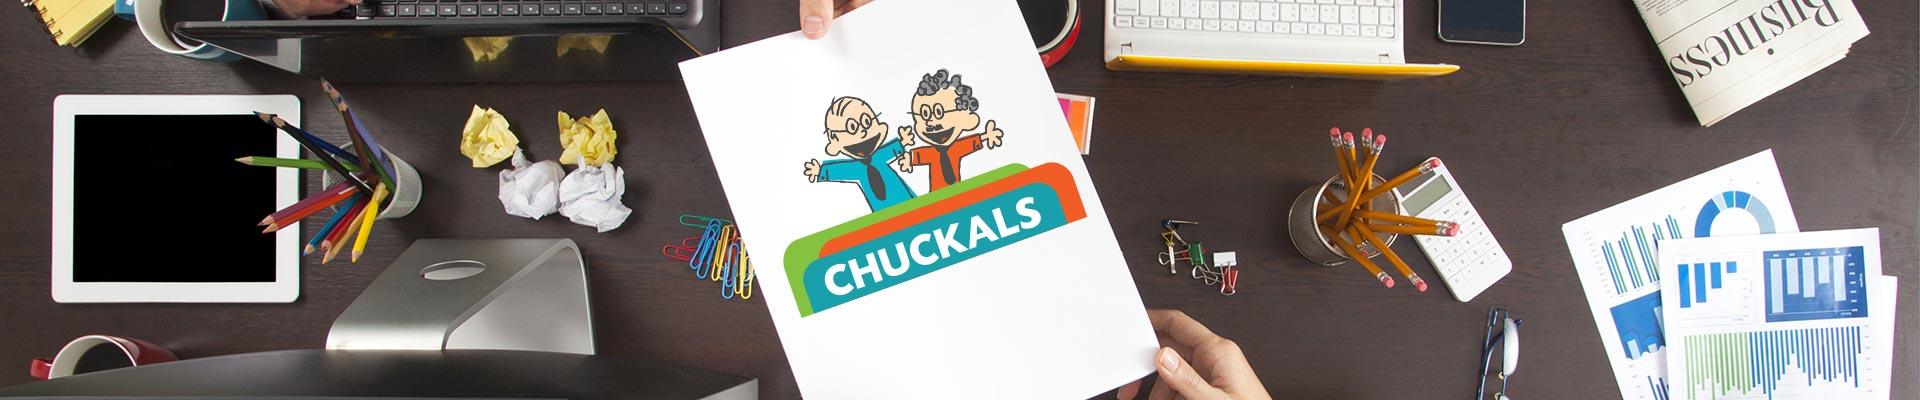 Chuckals hero image desk with Chuckals logo on paper